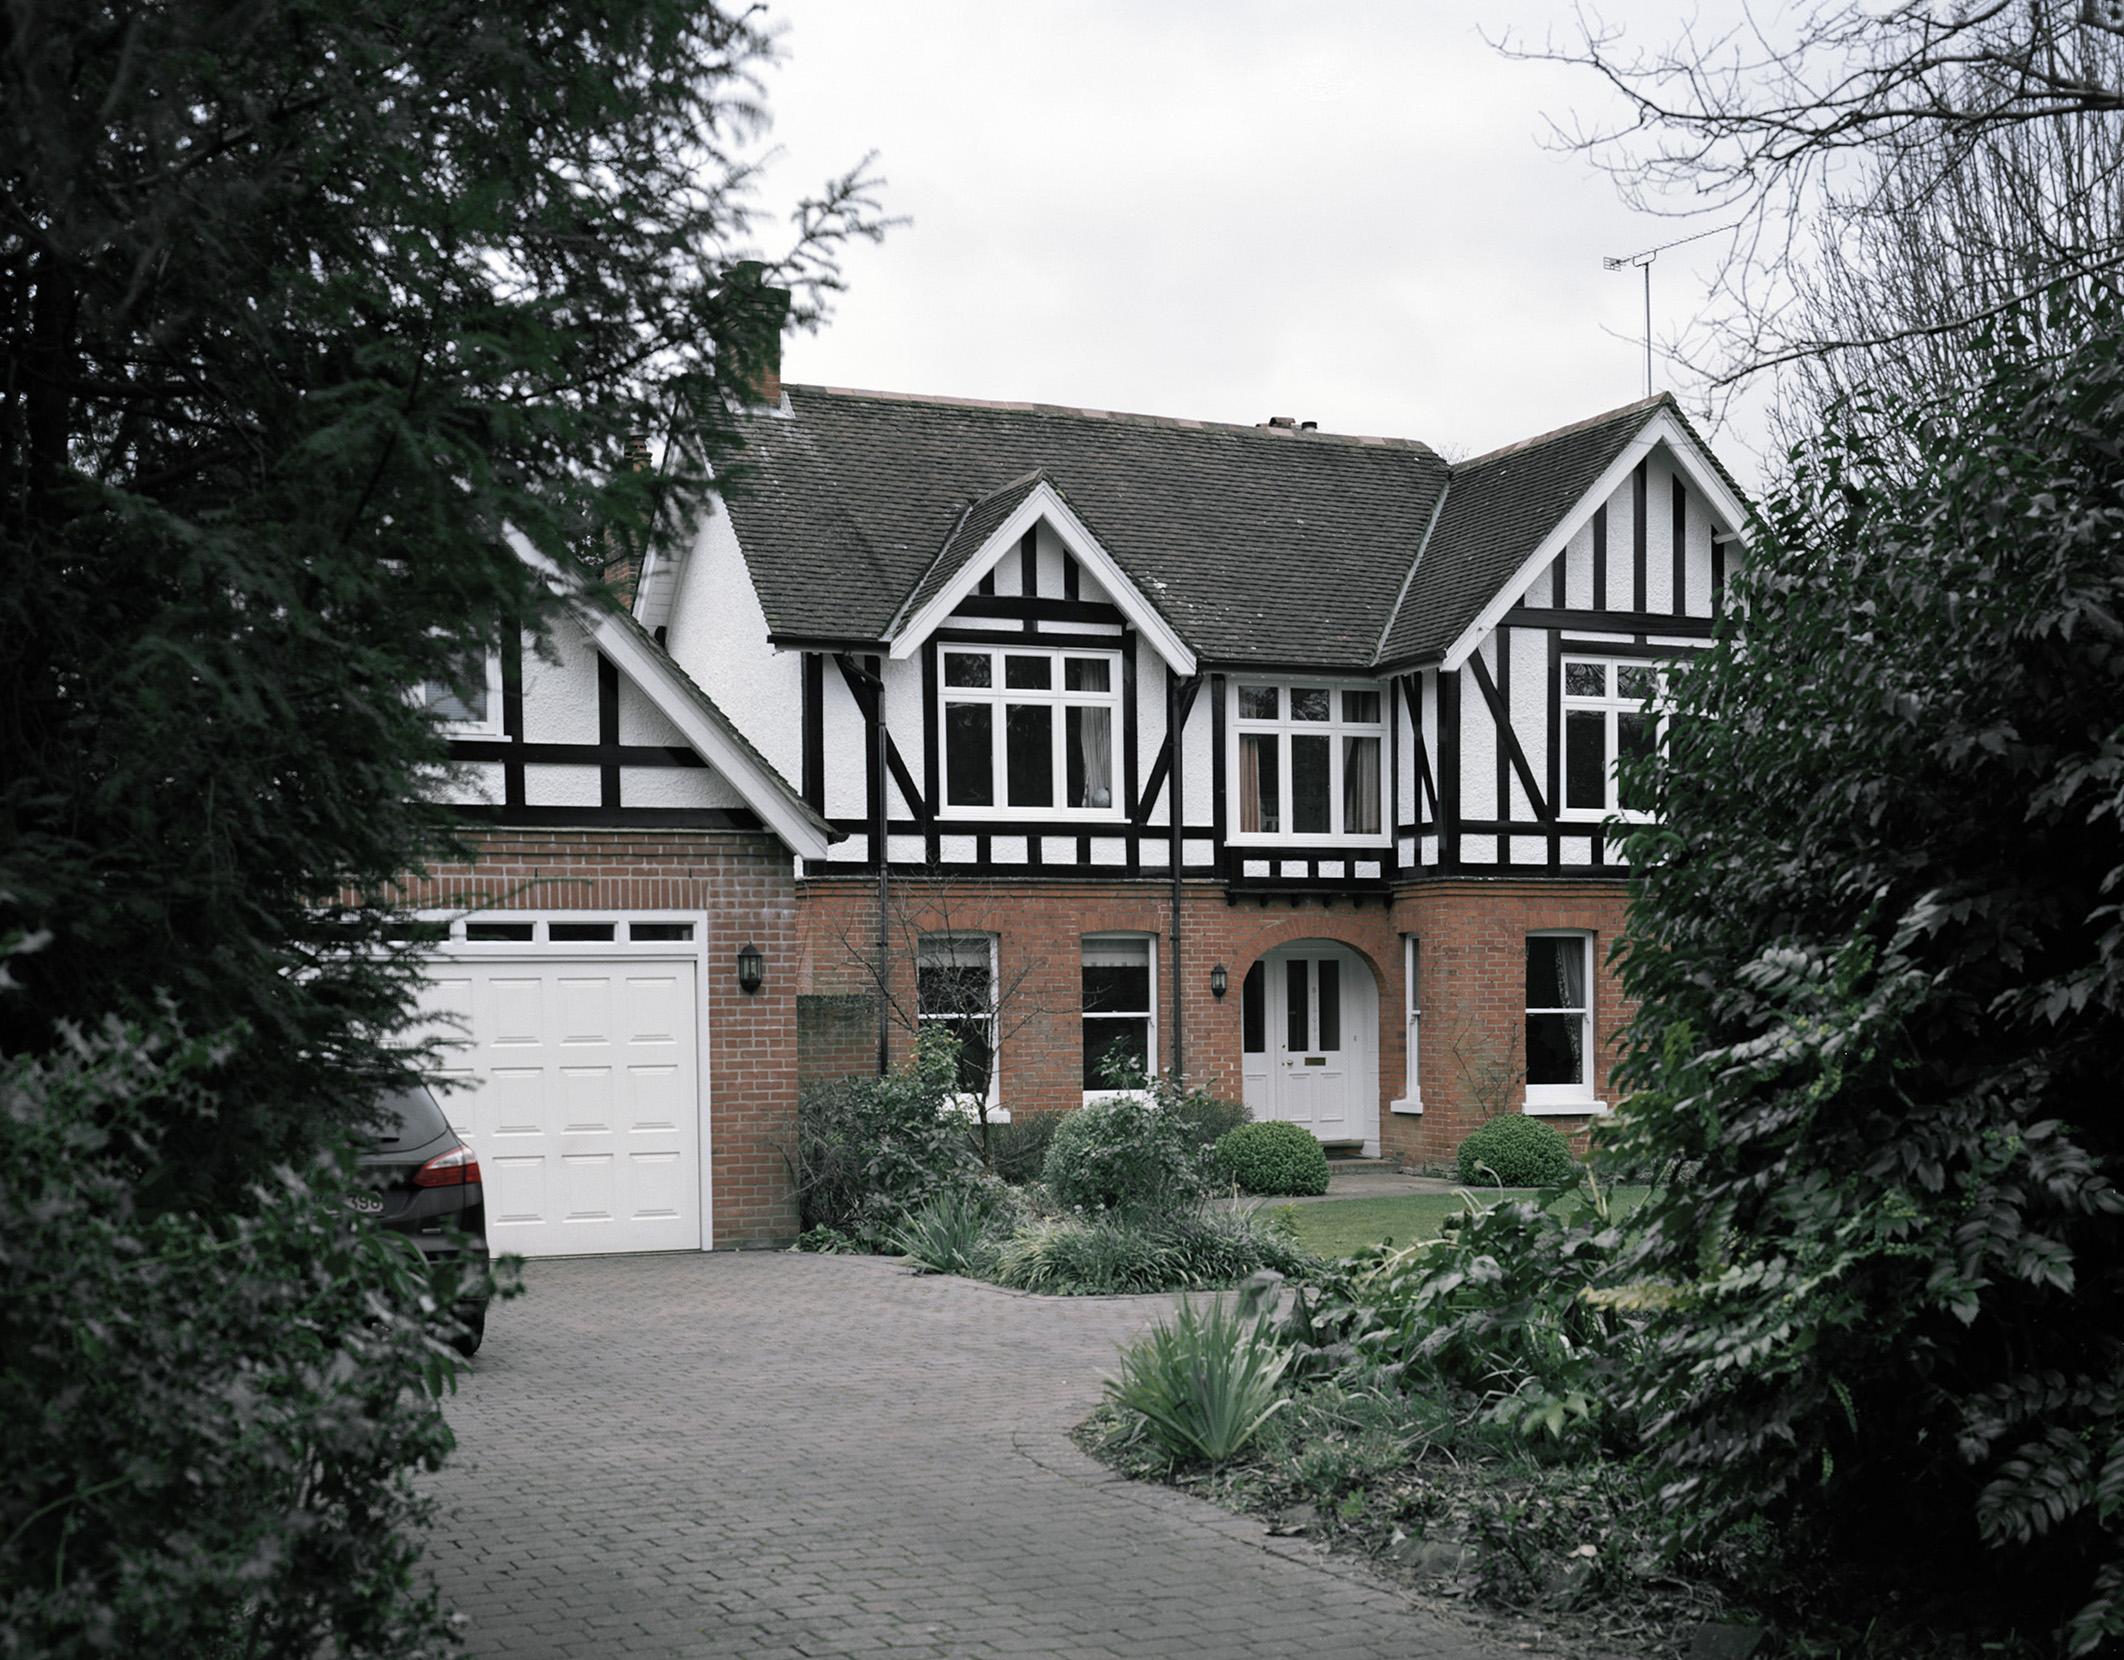 House two.jpg